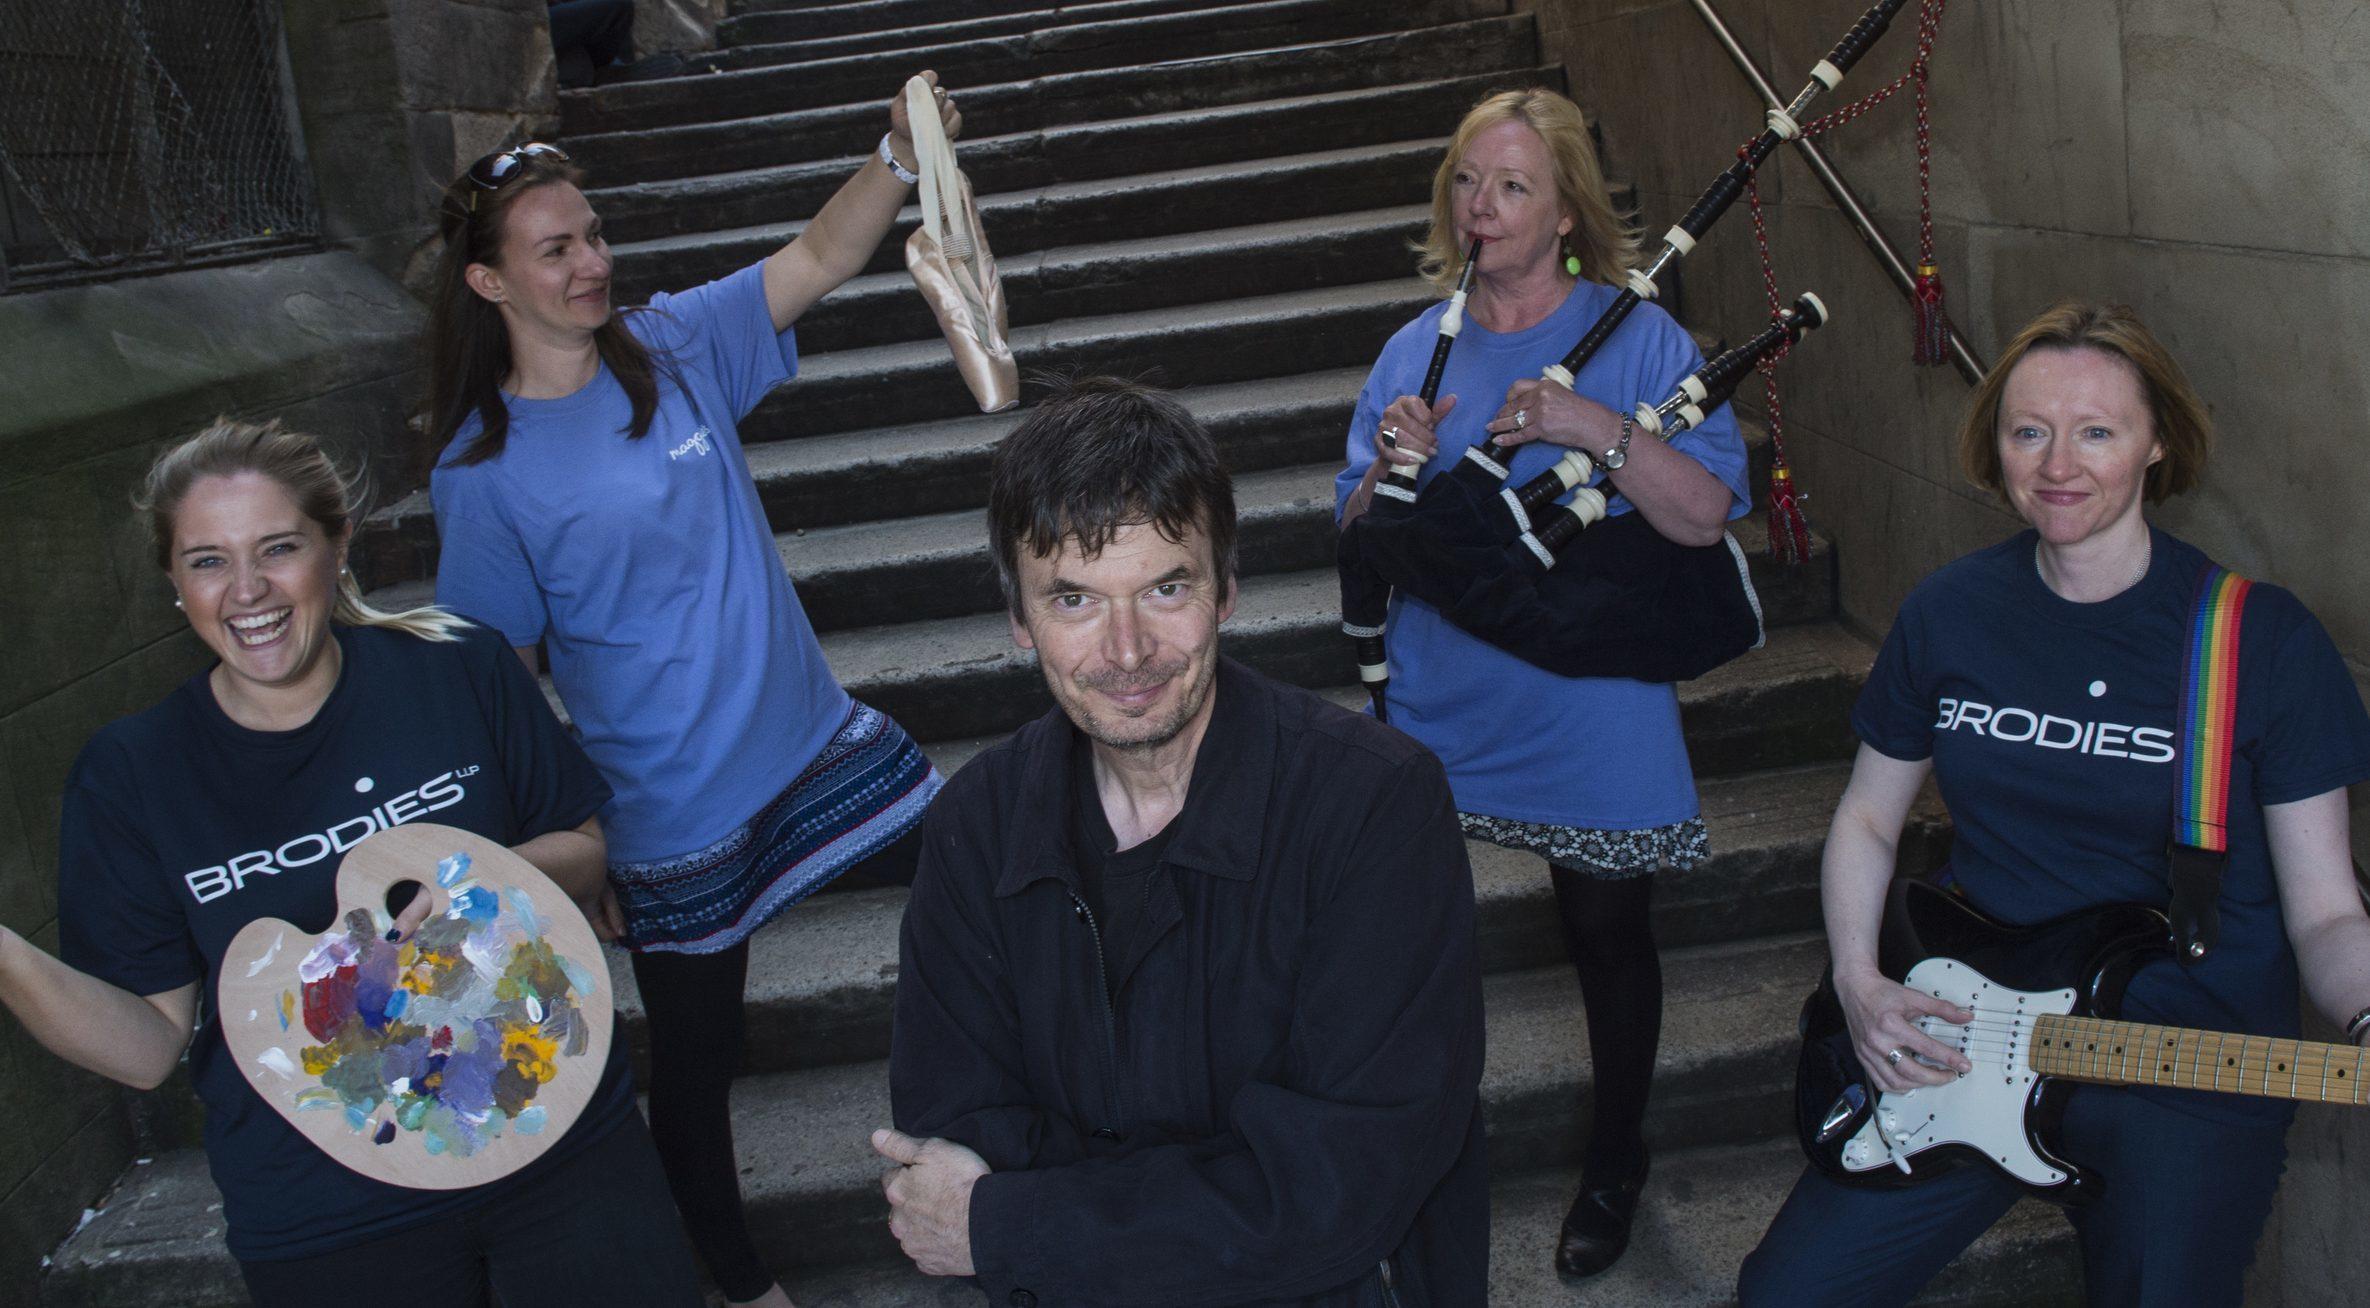 Ian Rankin is launching Maggies Culture Crawl events